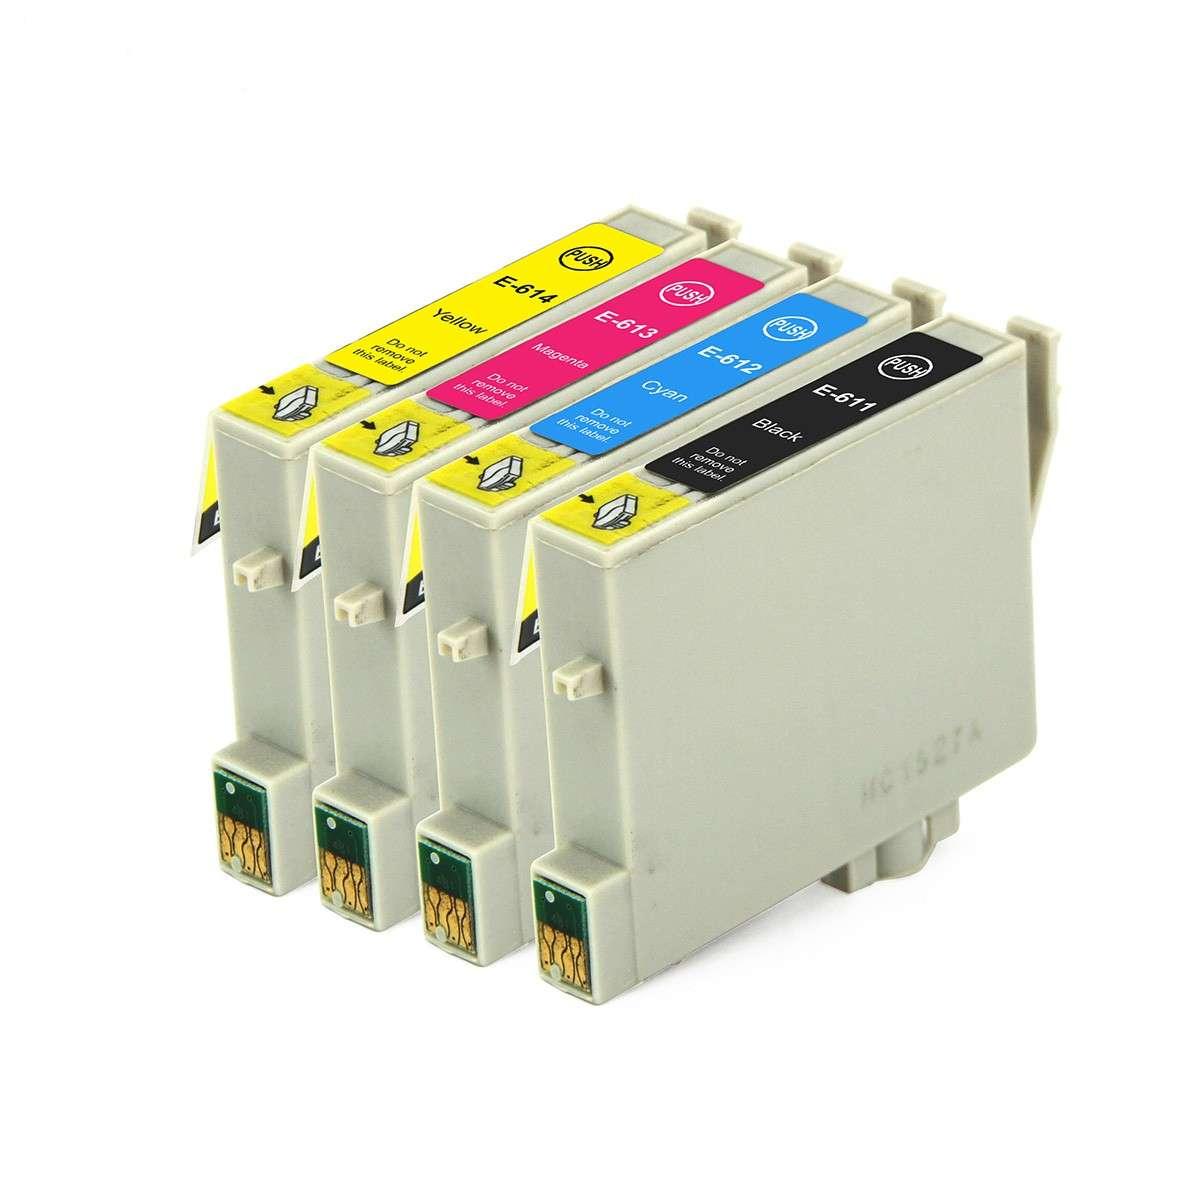 Epson Multipack Ink Cartridges (T0611-T0614)